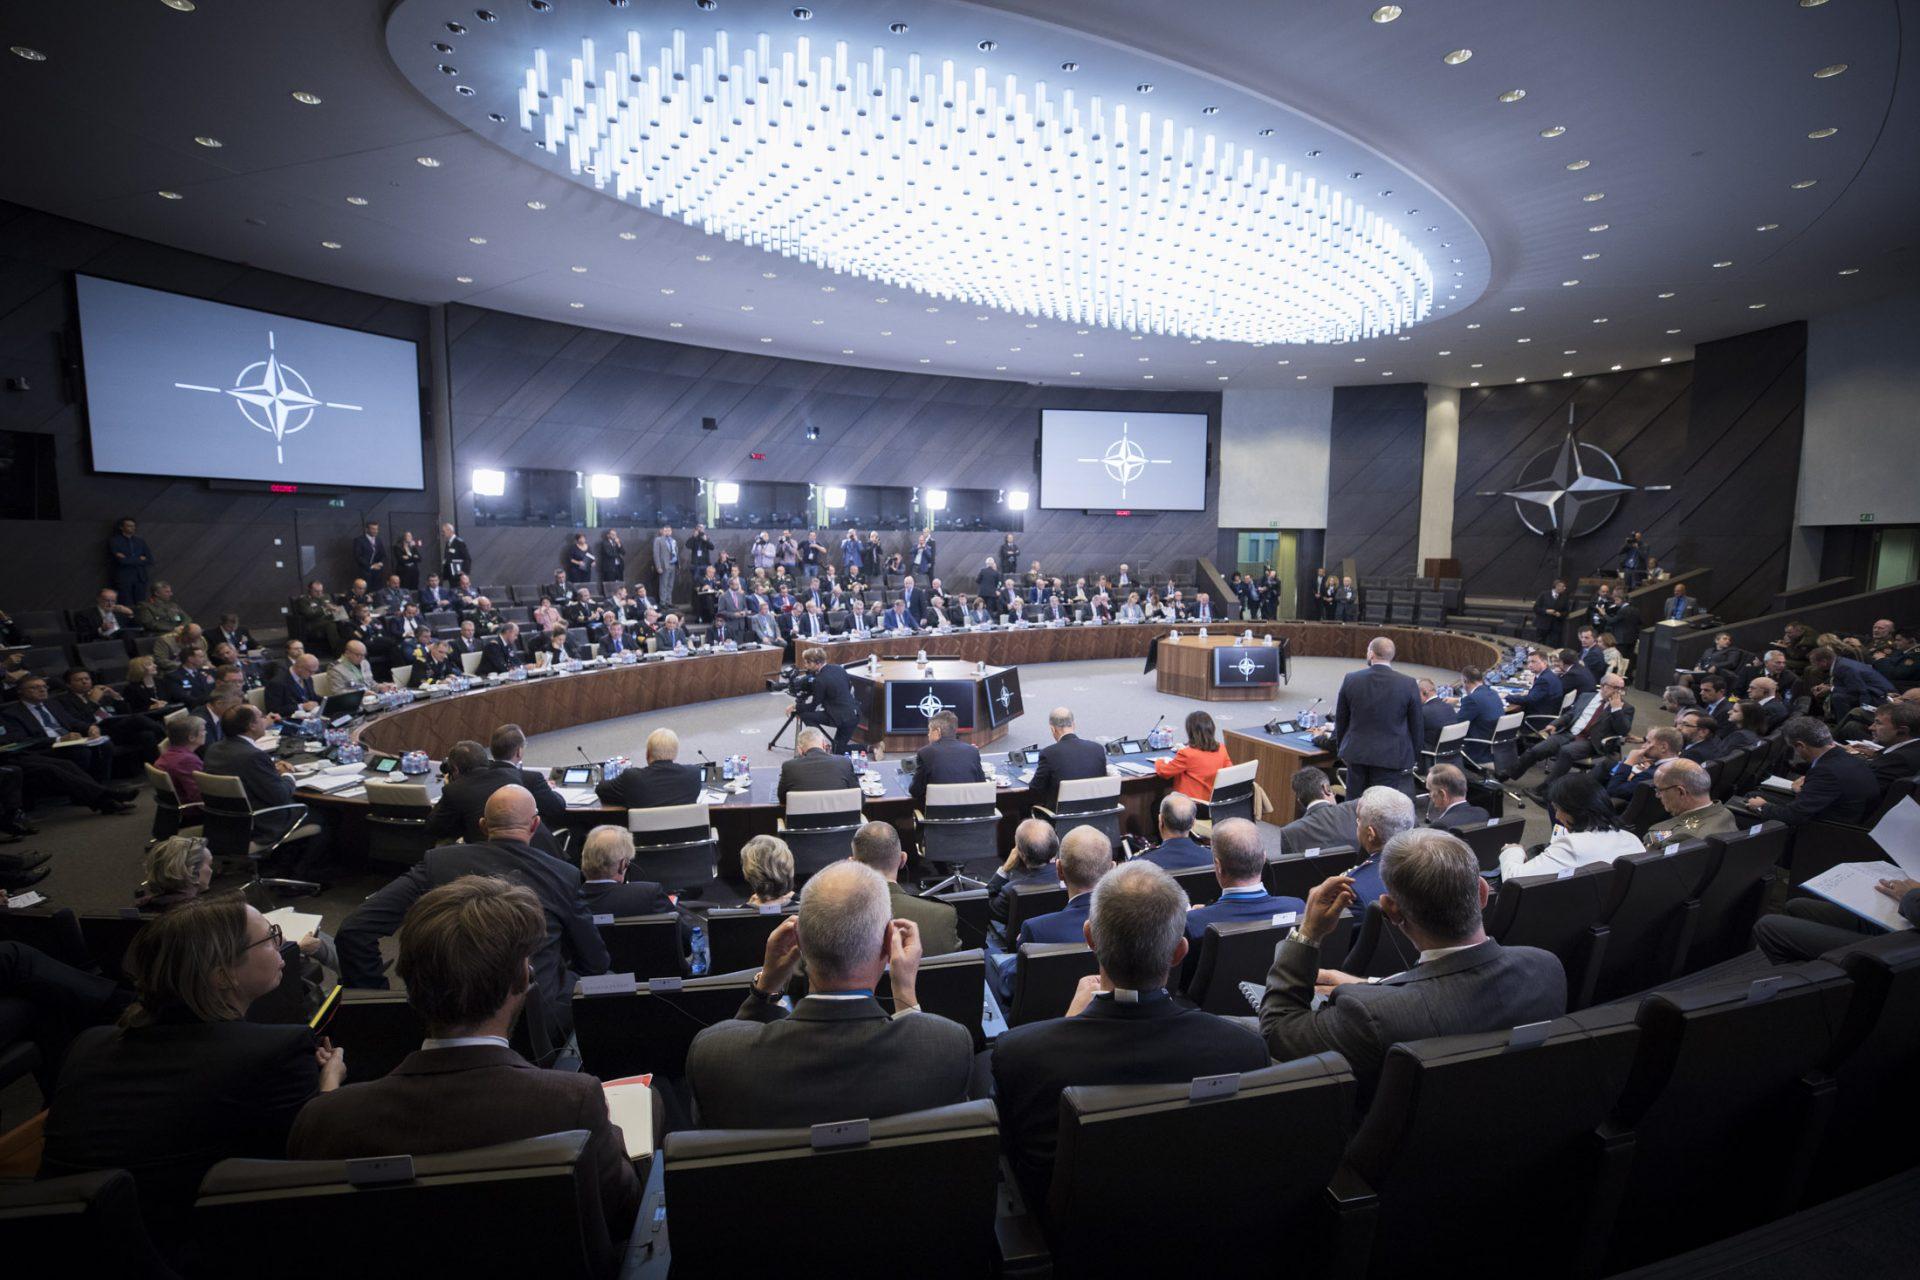 north atlantic council meeting - HD1170×779